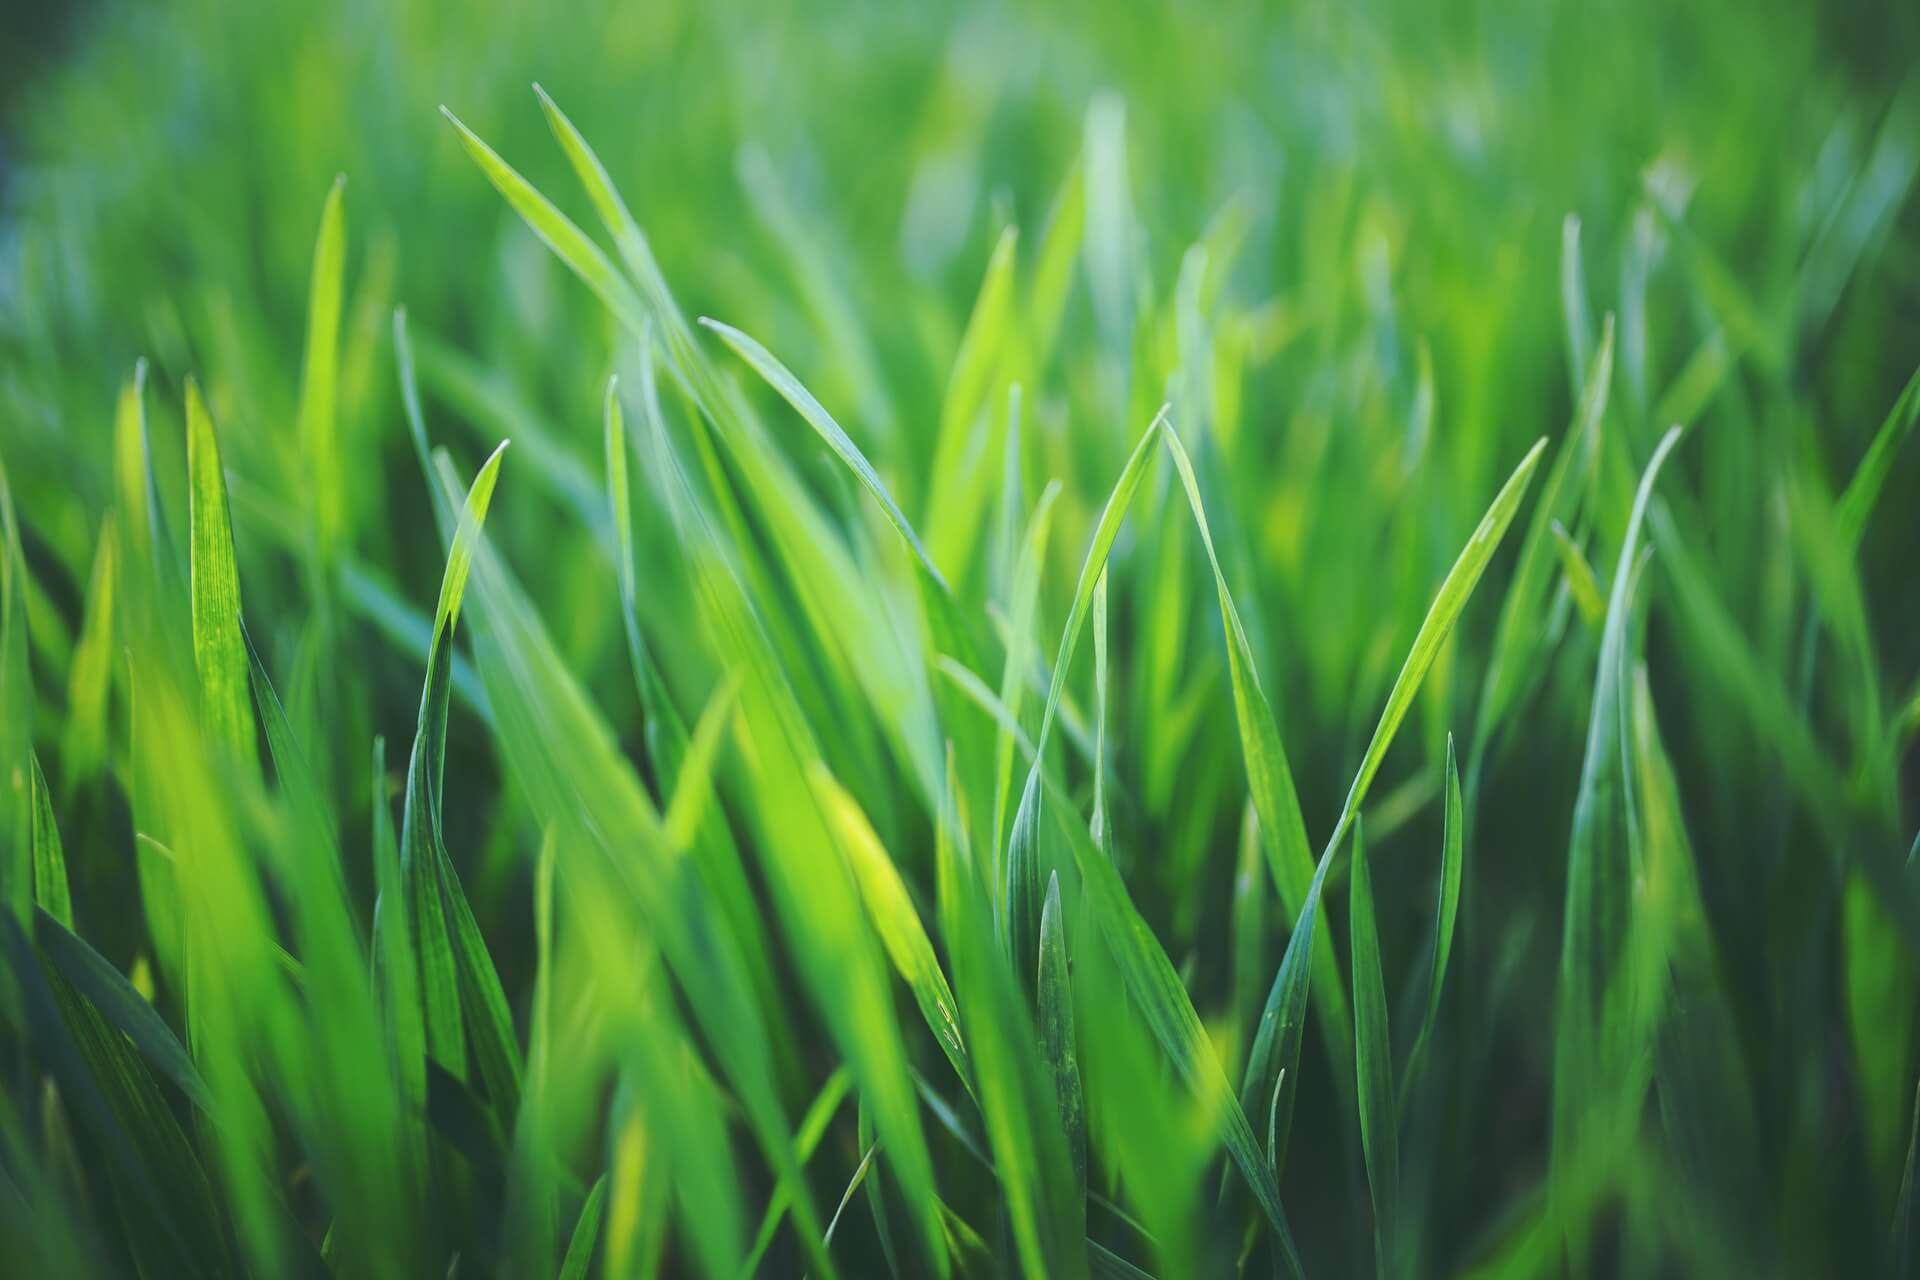 green-touch-jardinier genève